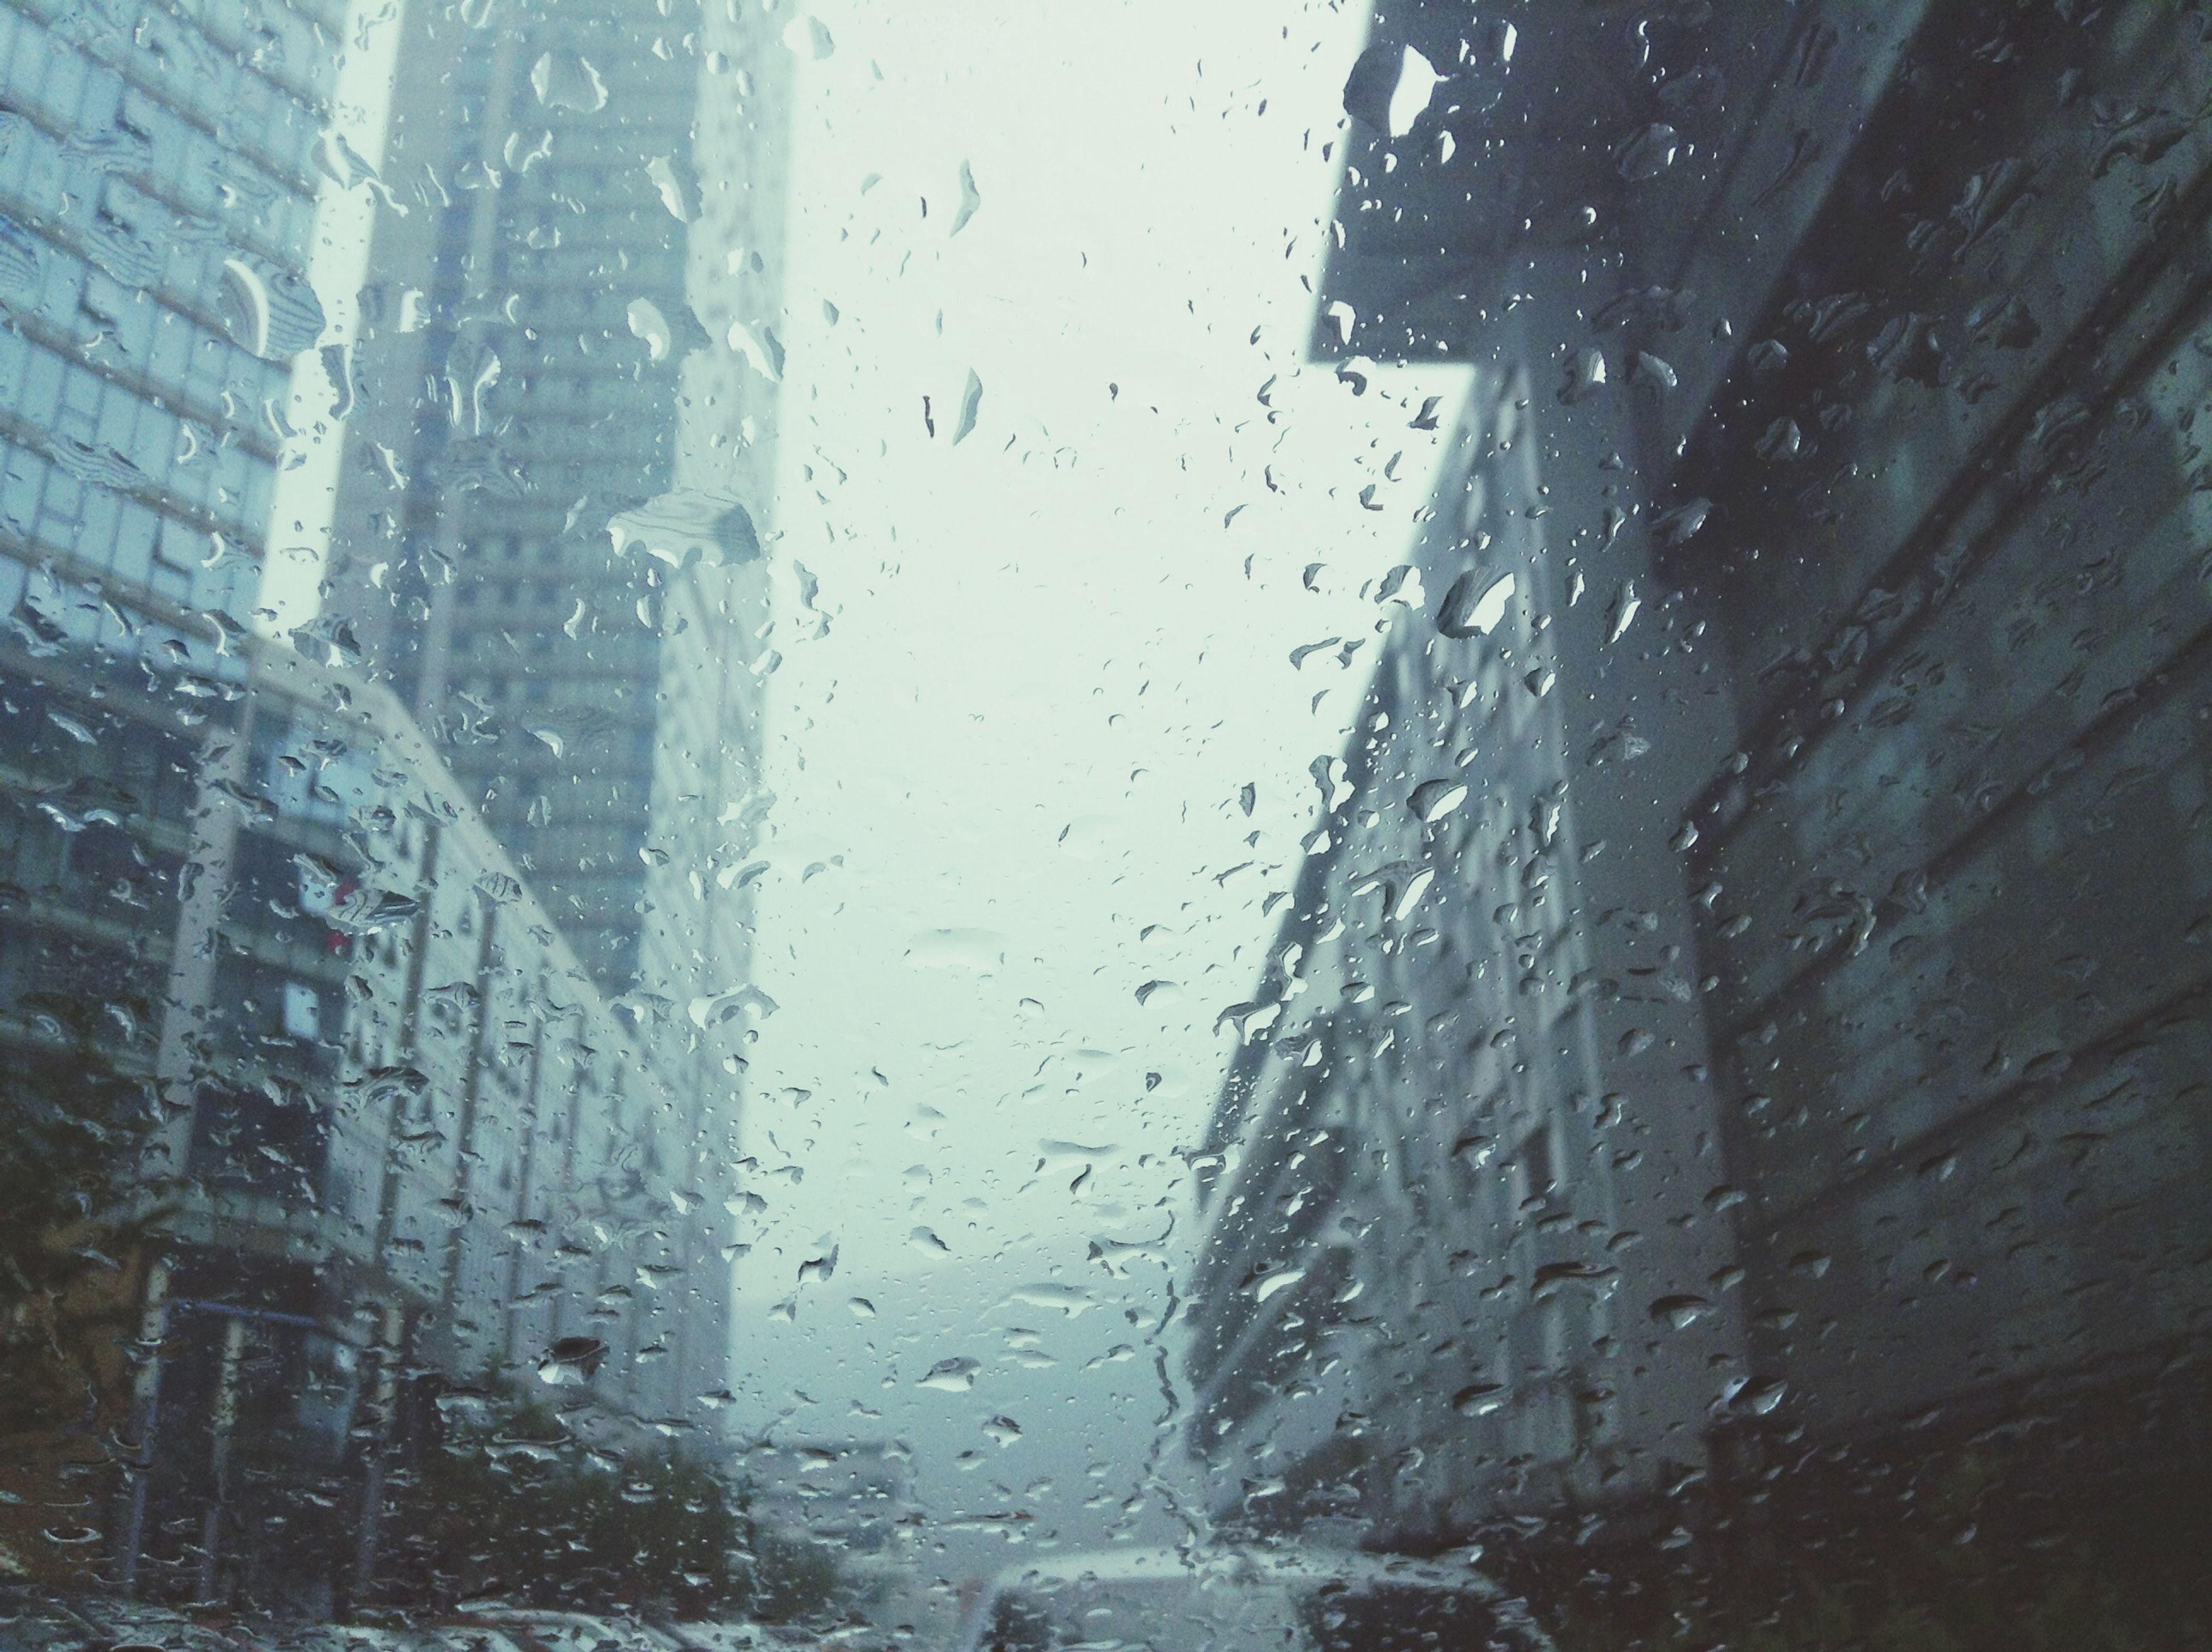 window, architecture, built structure, building exterior, wet, indoors, glass - material, drop, rain, water, transparent, building, weather, season, city, day, residential building, house, residential structure, glass